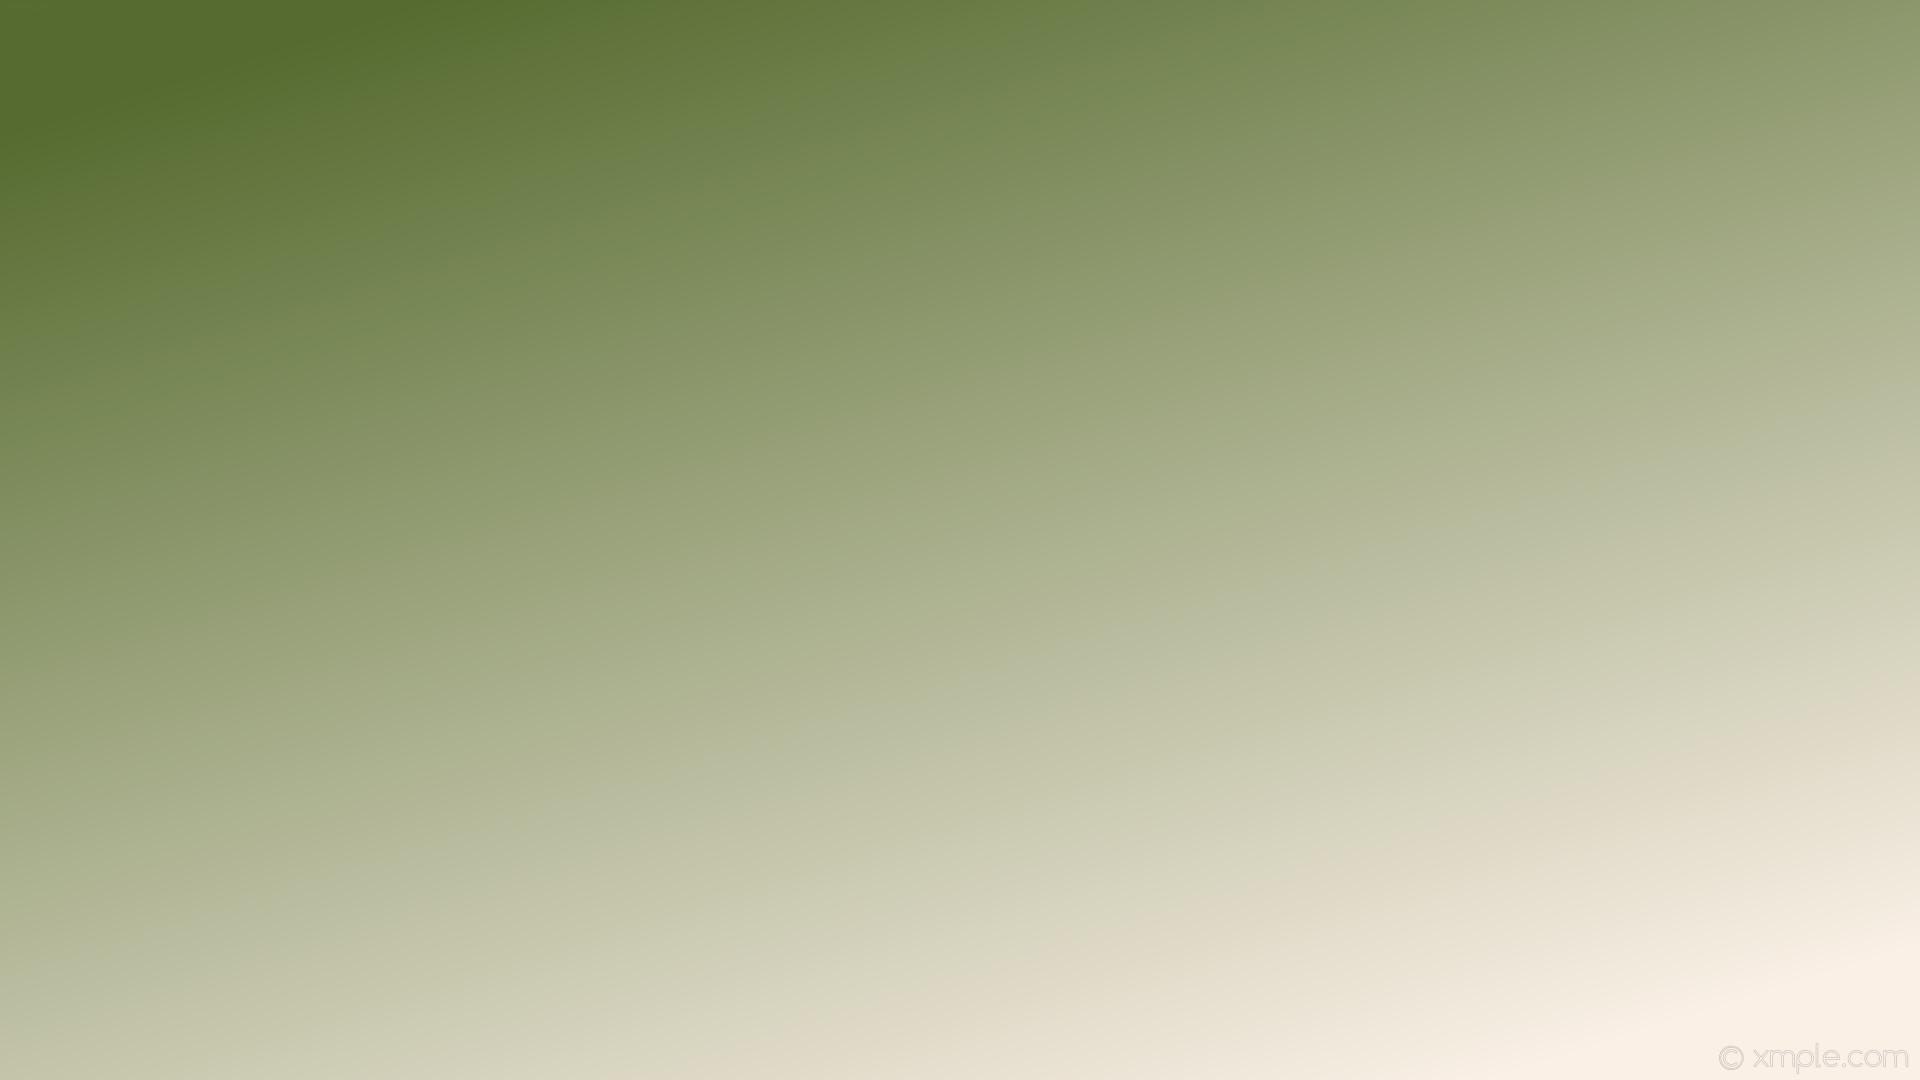 Olive Green Wallpaper 72 images